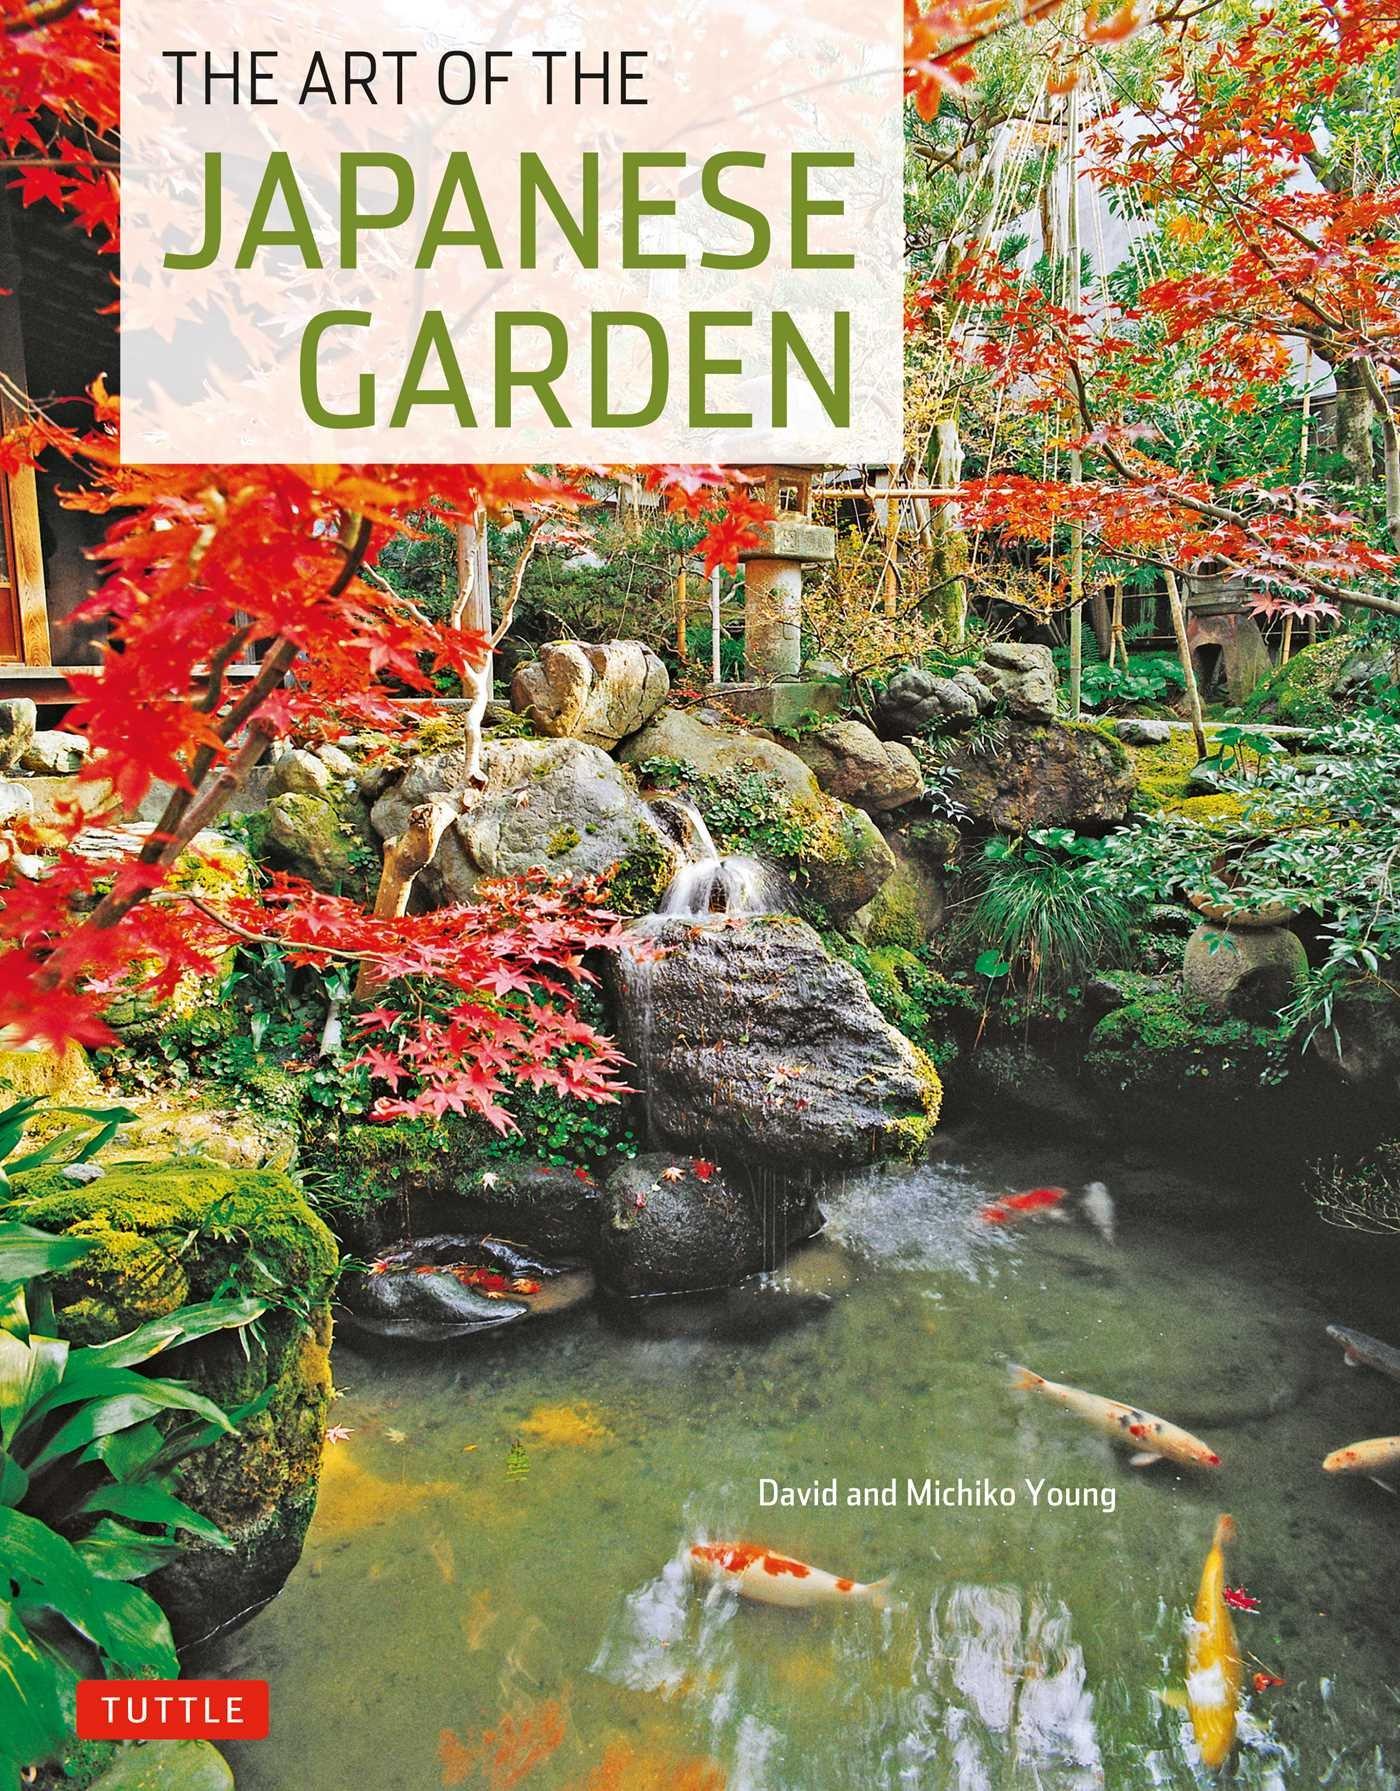 Amazon.com: Art of the Japanese Garden (9784805311257): David ...